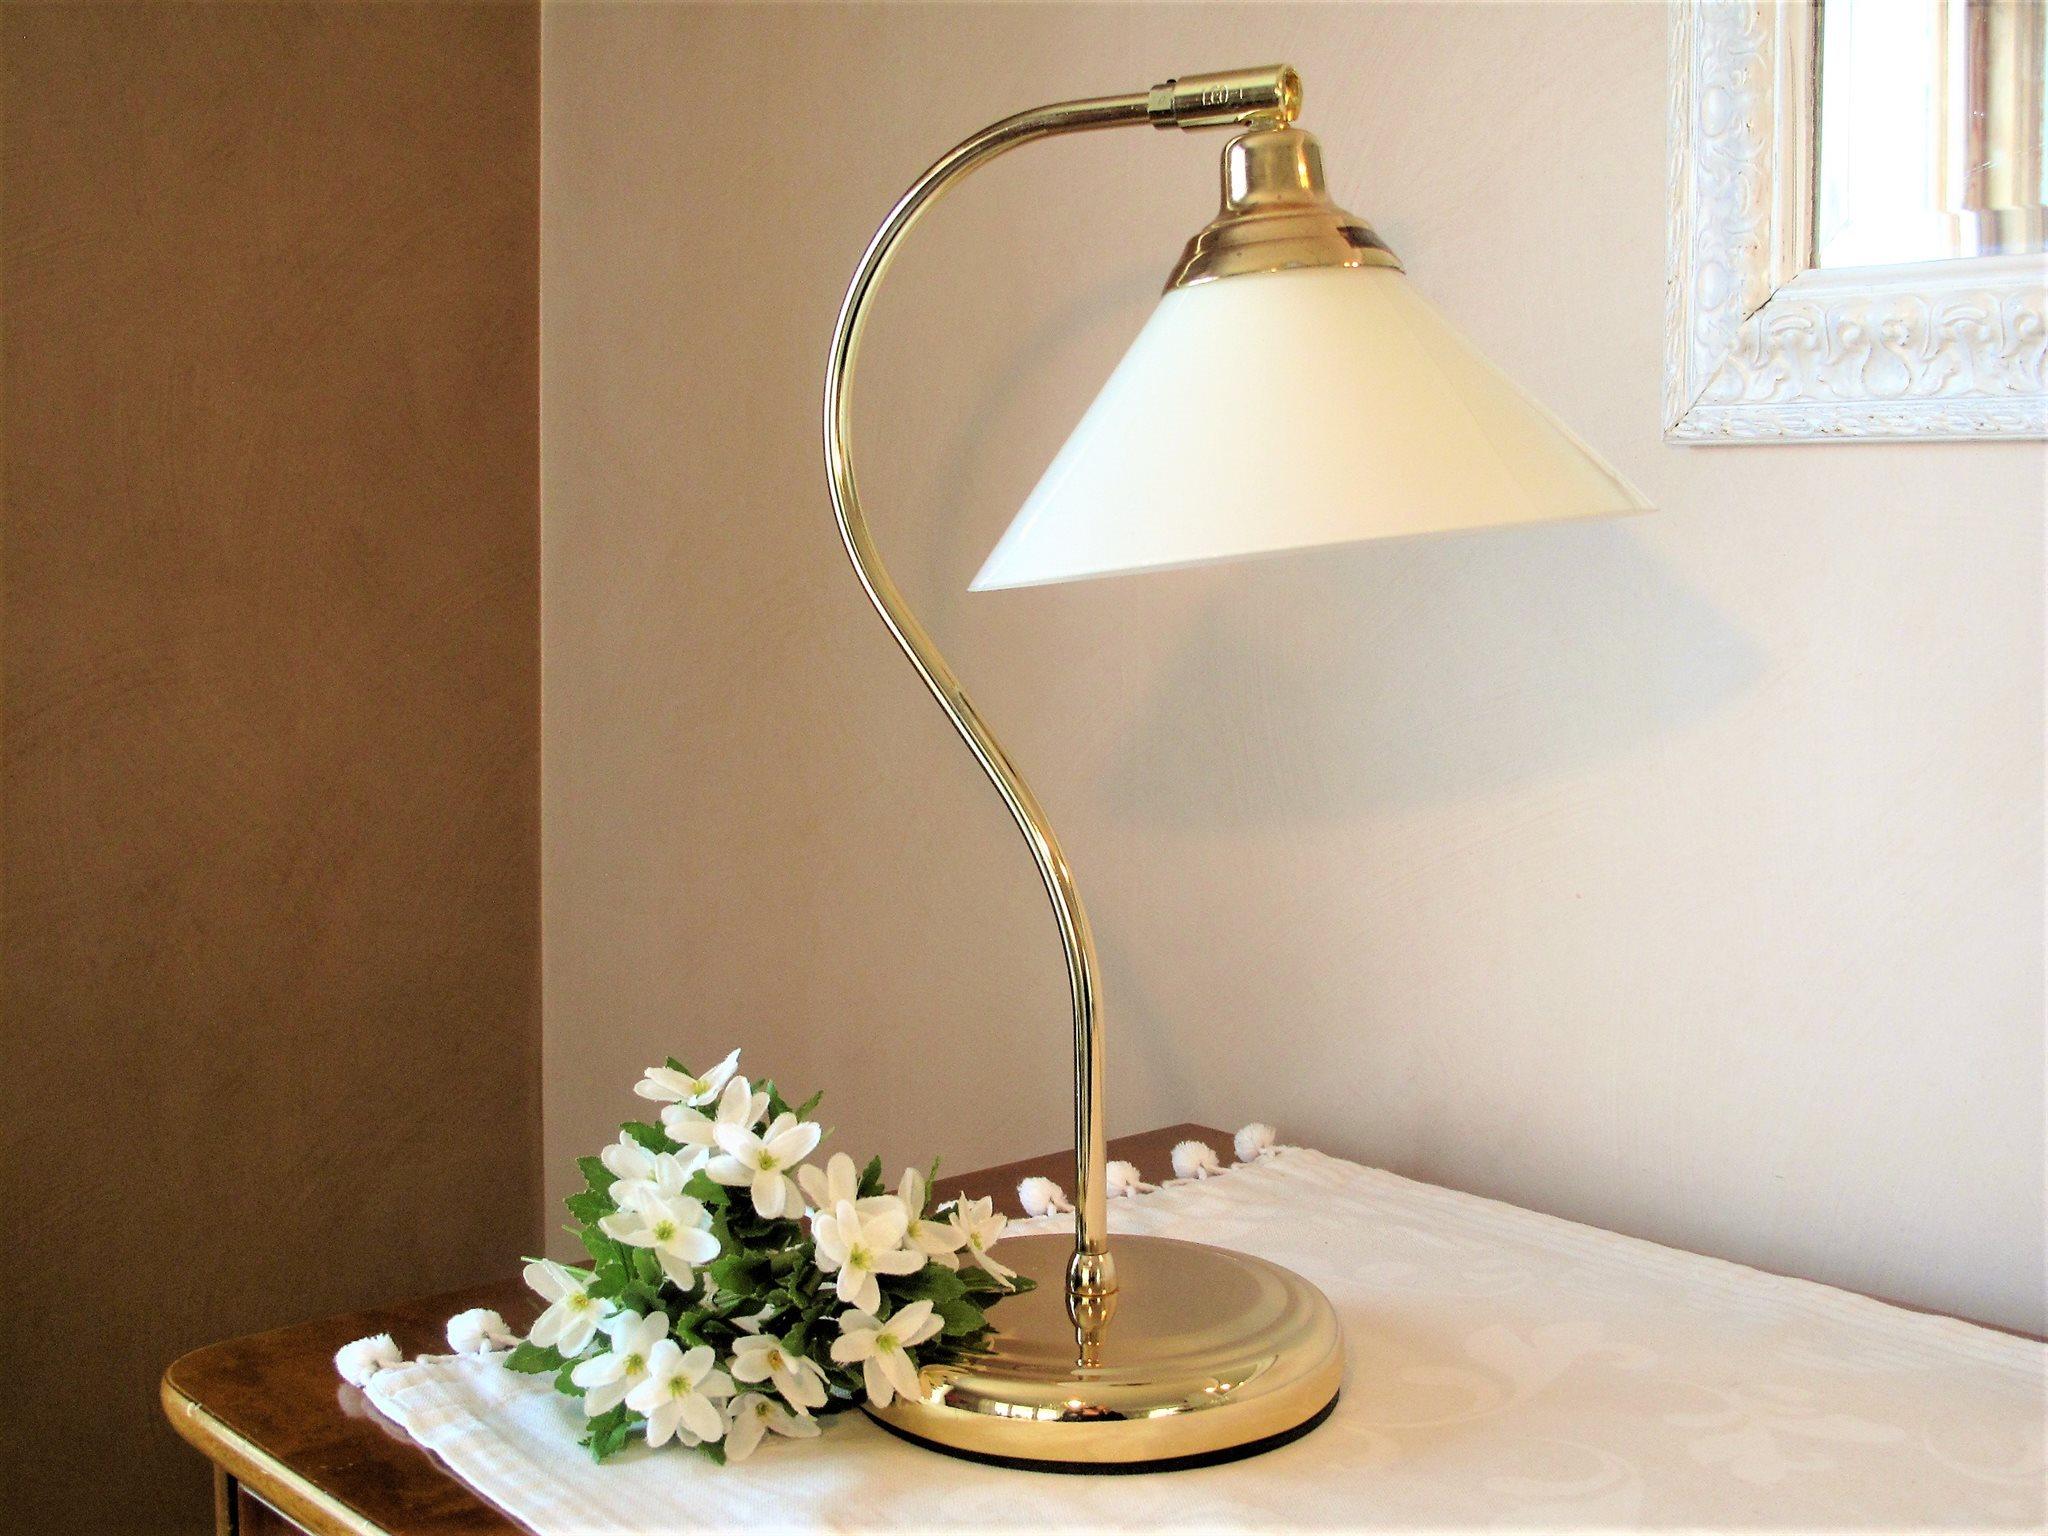 staande lamp wit glas staande lamp wit glas zen natuzzi italia. Black Bedroom Furniture Sets. Home Design Ideas